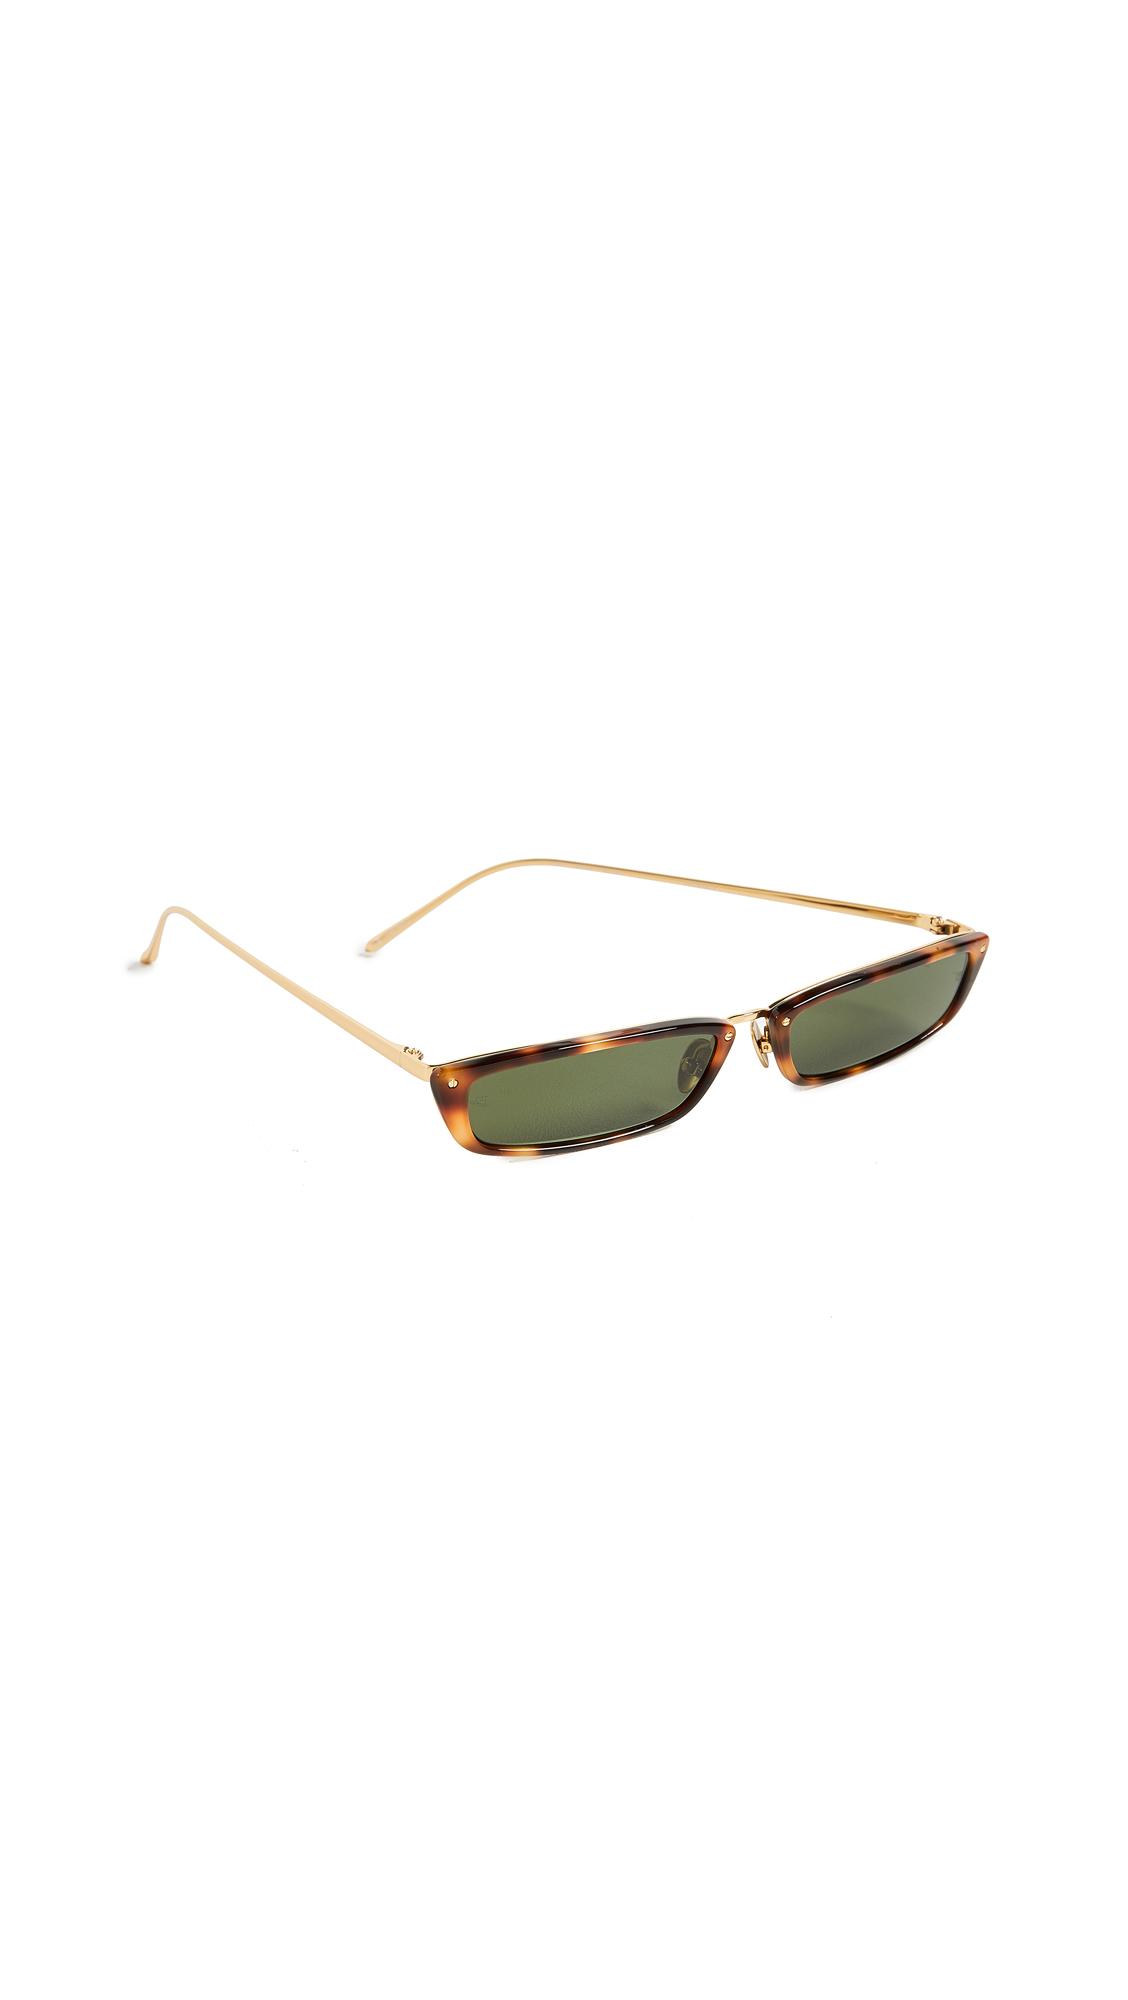 LINDA FARROW LUXE Narrow Rectangular Sunglasses in Brown/Green